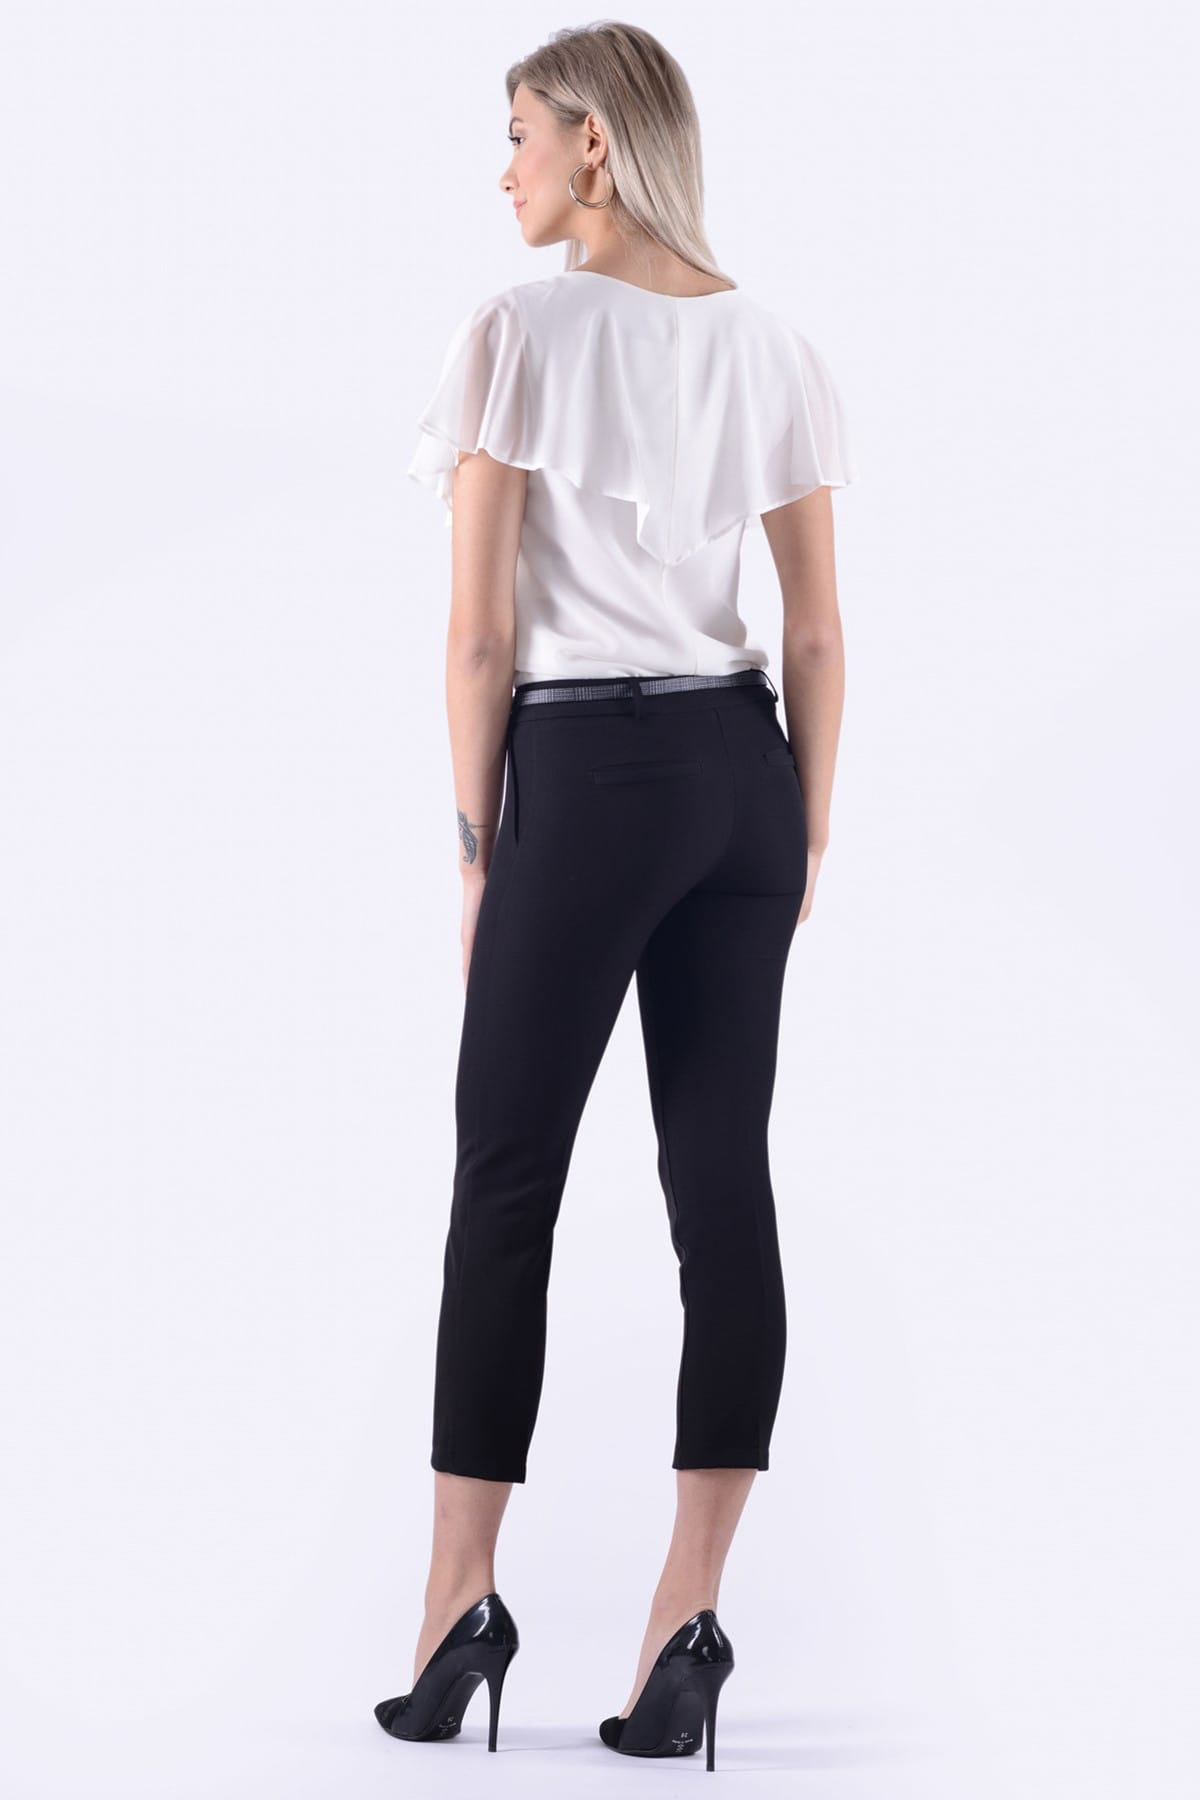 İroni Kadın Siyah Dar Paça Kumaş Pantolon 1581-891K 2